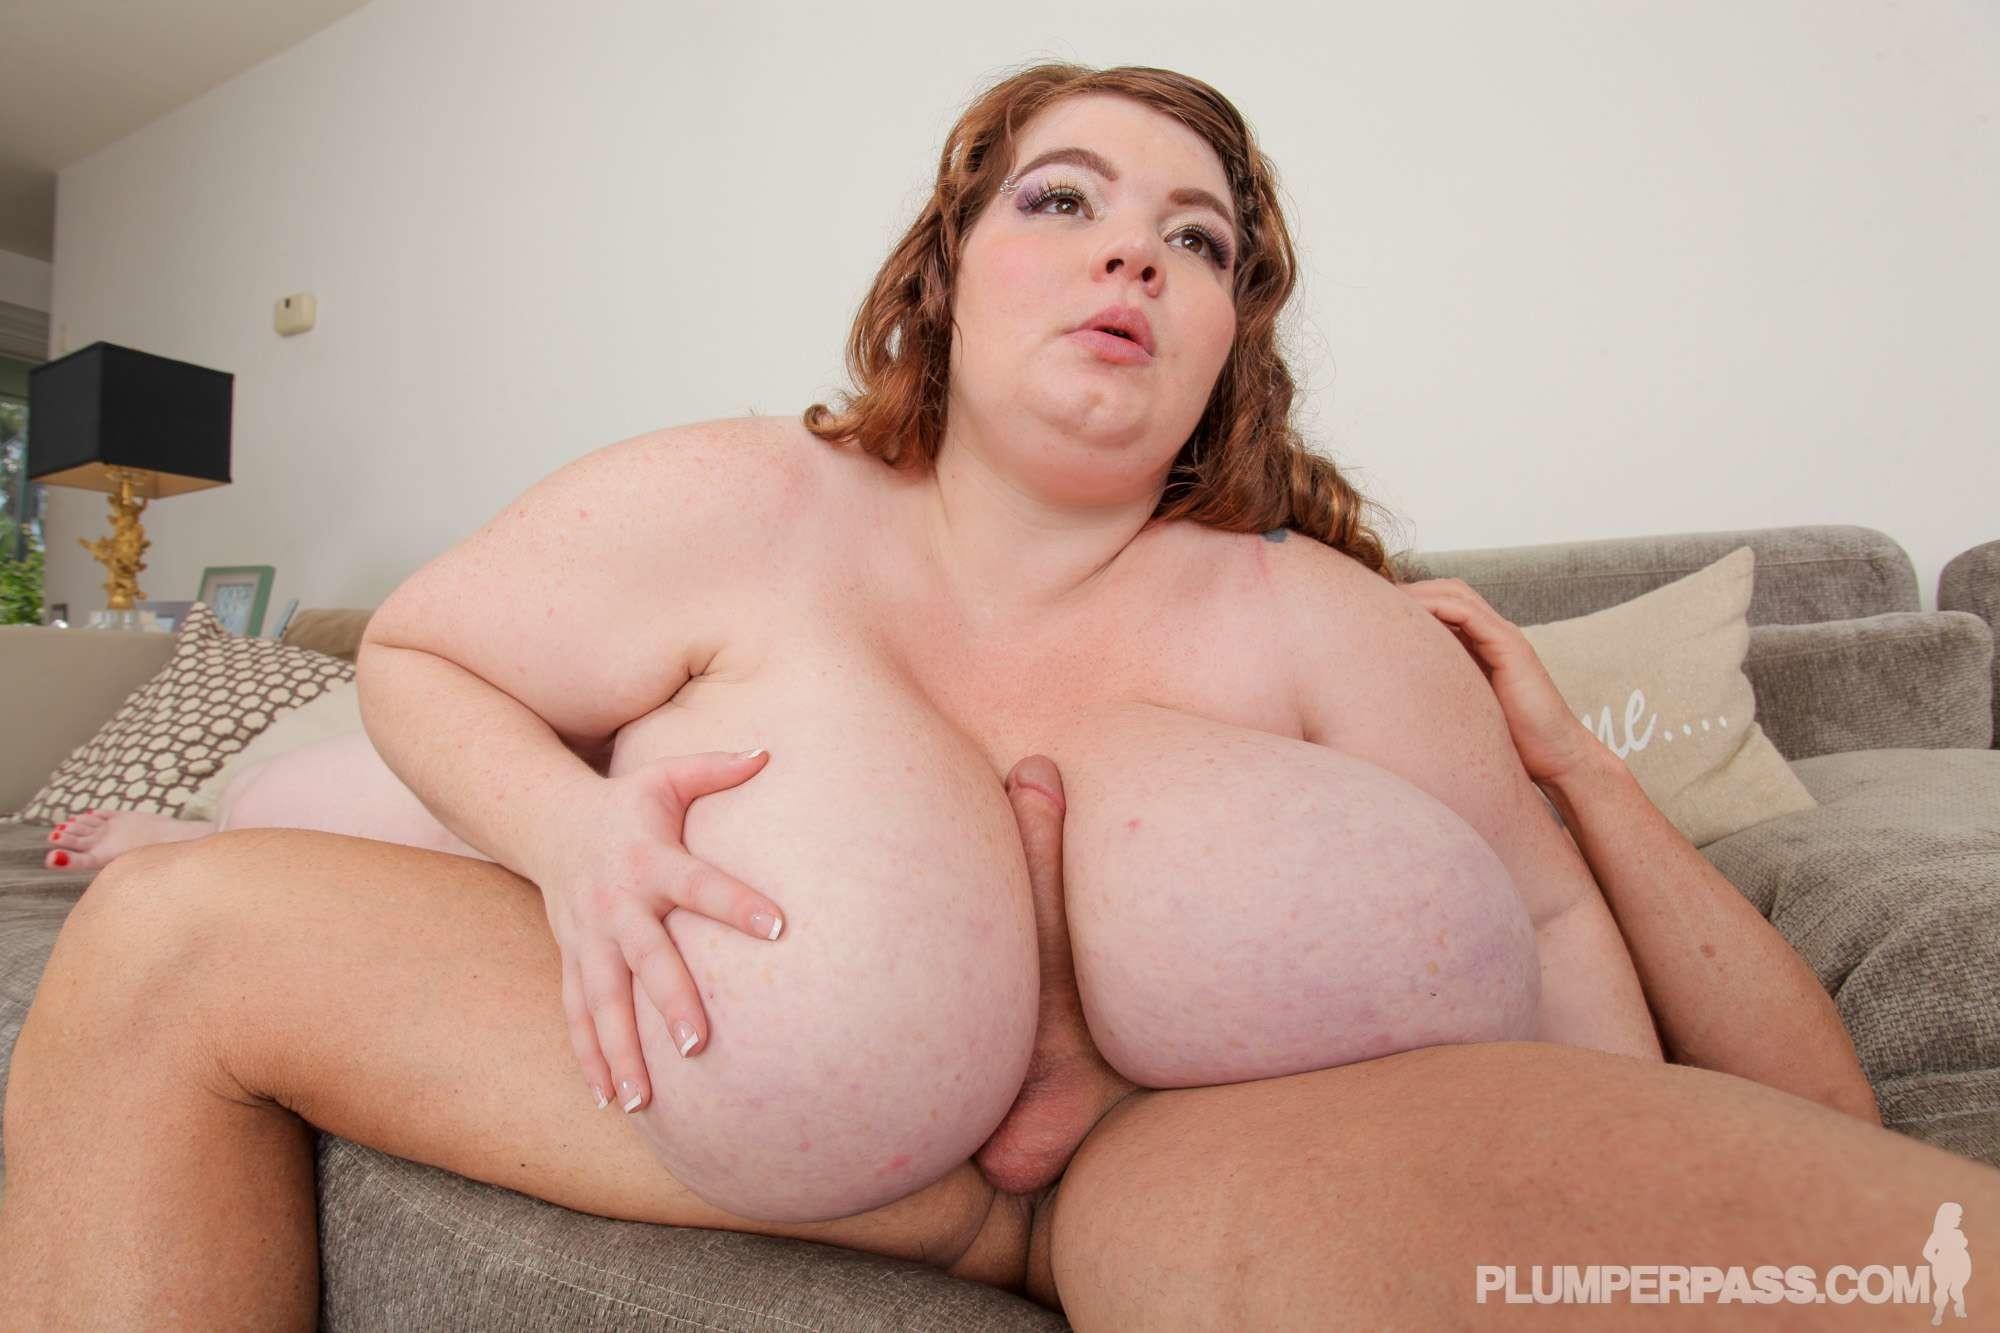 Жирные жопы женщин - компиляция 11